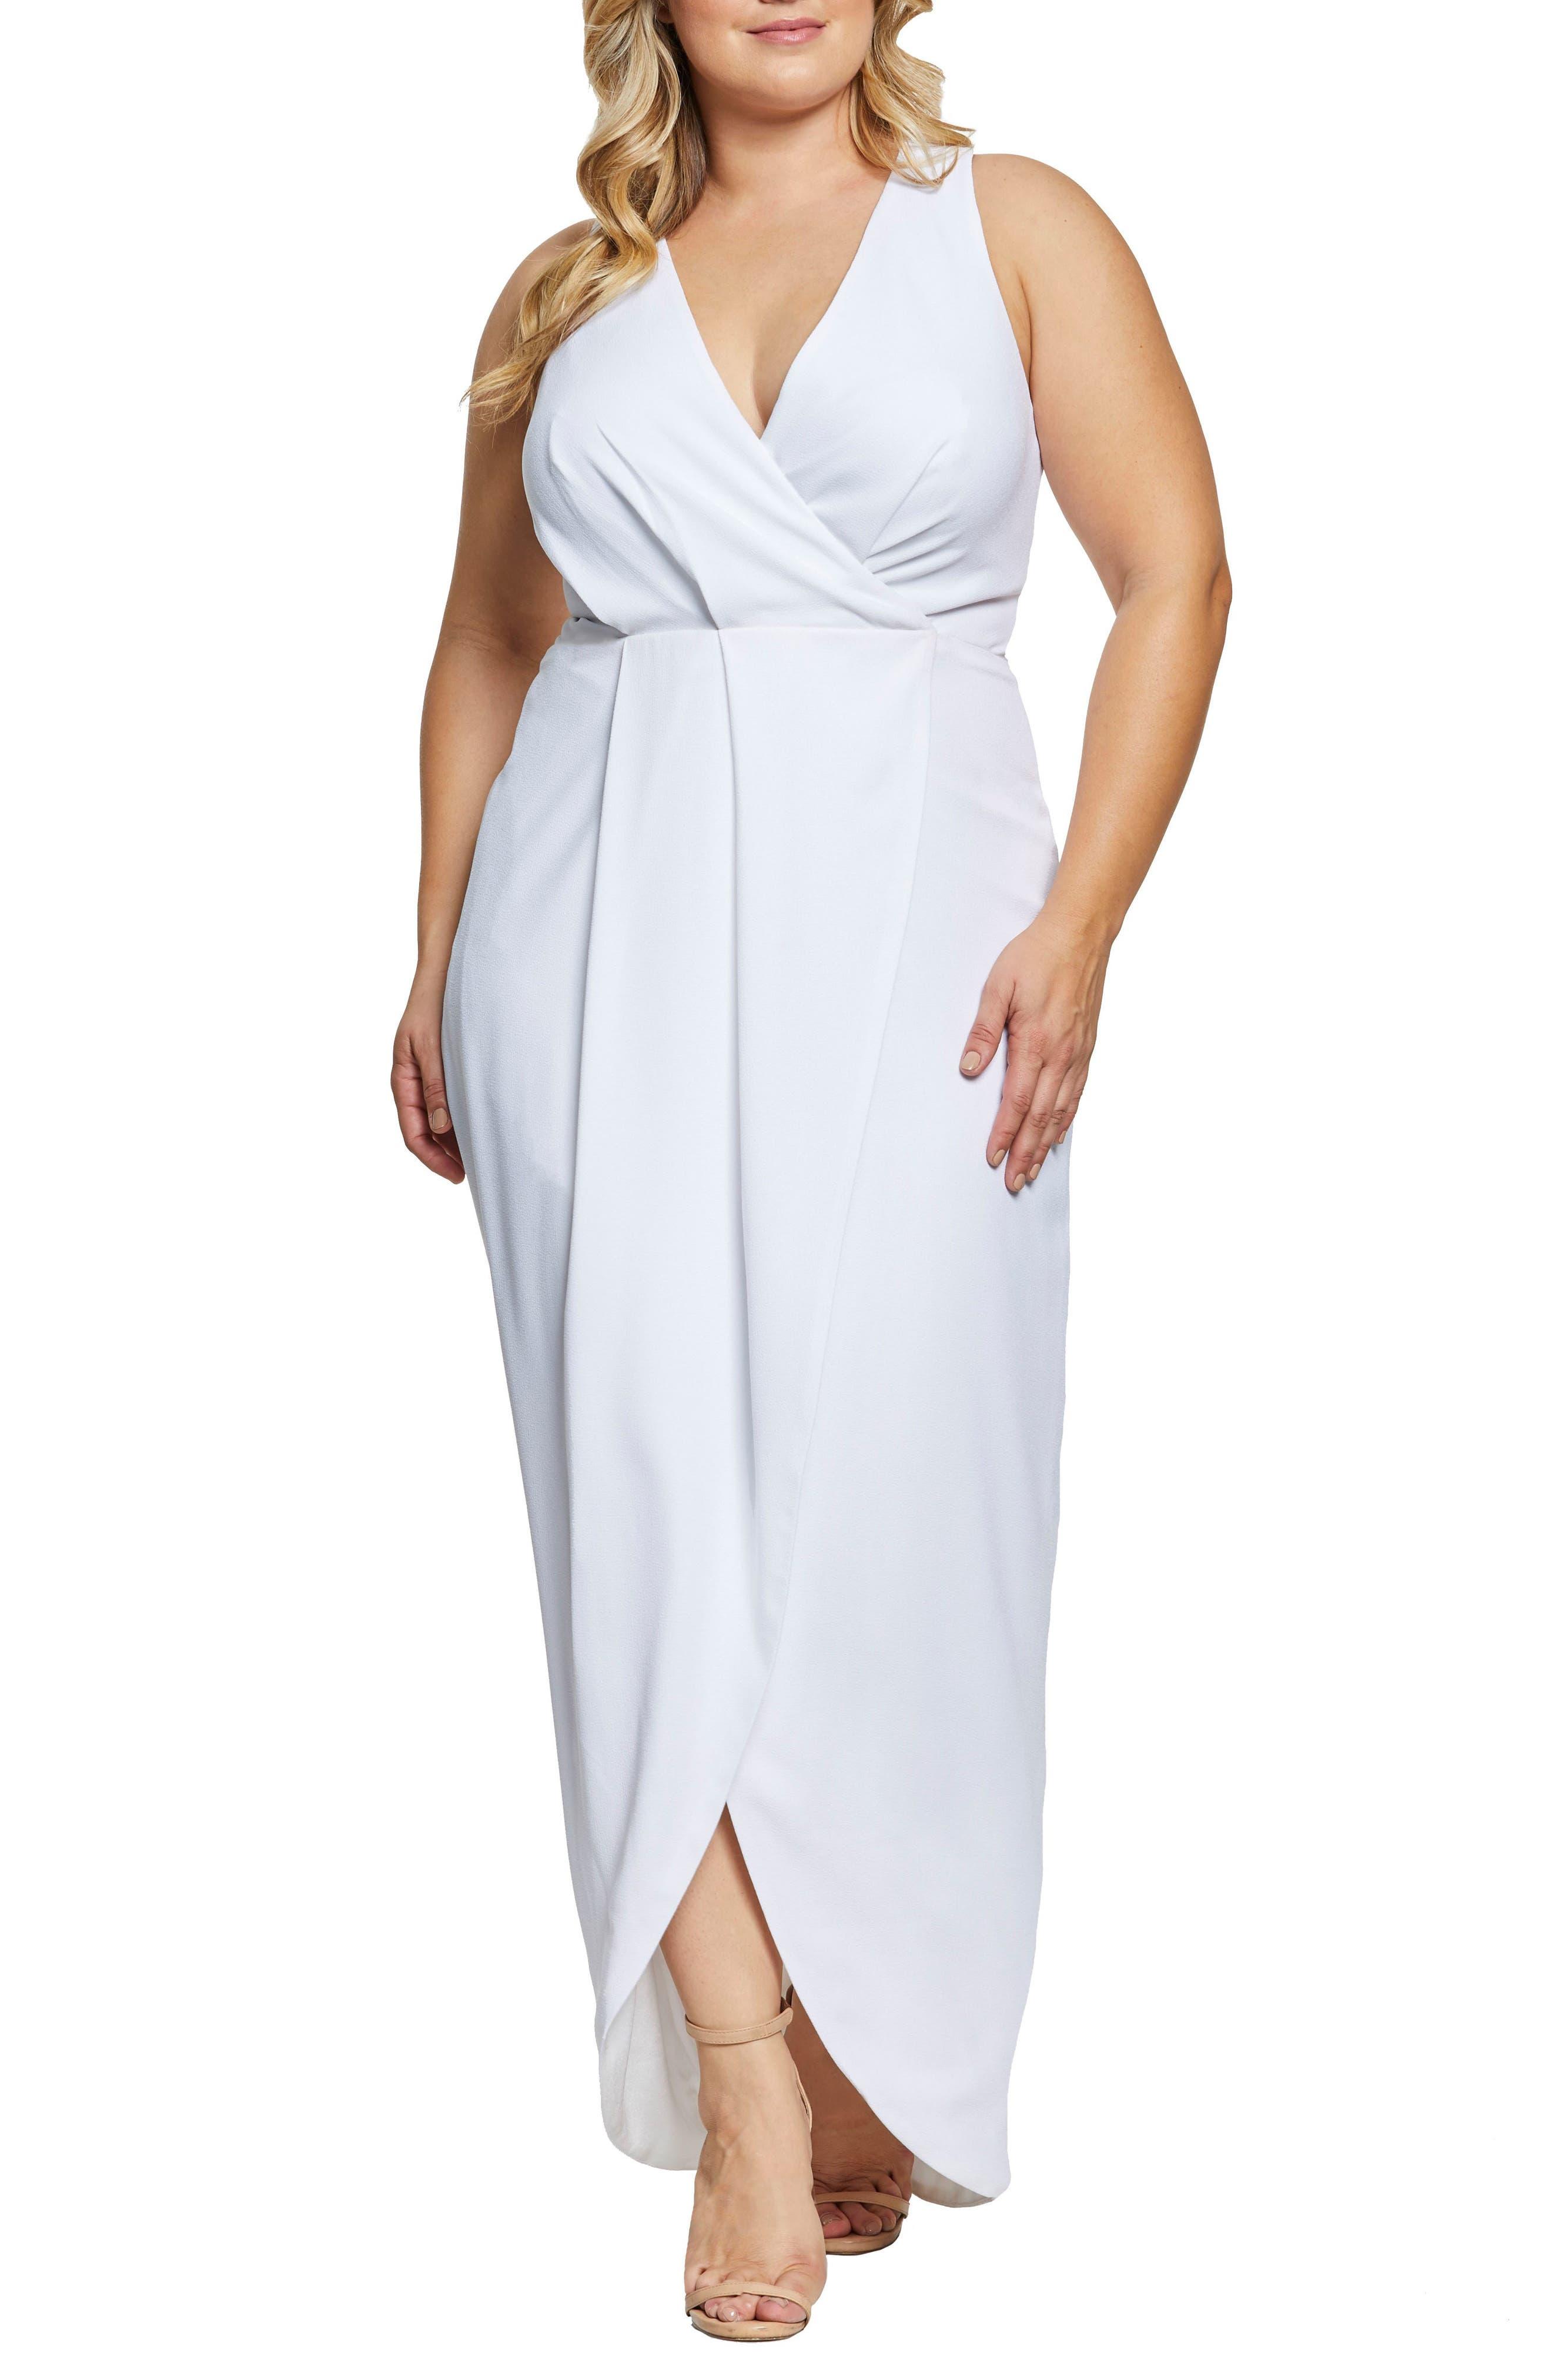 1960s – 70s Cocktail, Party, Prom, Evening Dresses Plus Size Womens Dress The Population Ariel Racerback Faux Wrap Evening Dress Size 2X - Ivory $248.00 AT vintagedancer.com